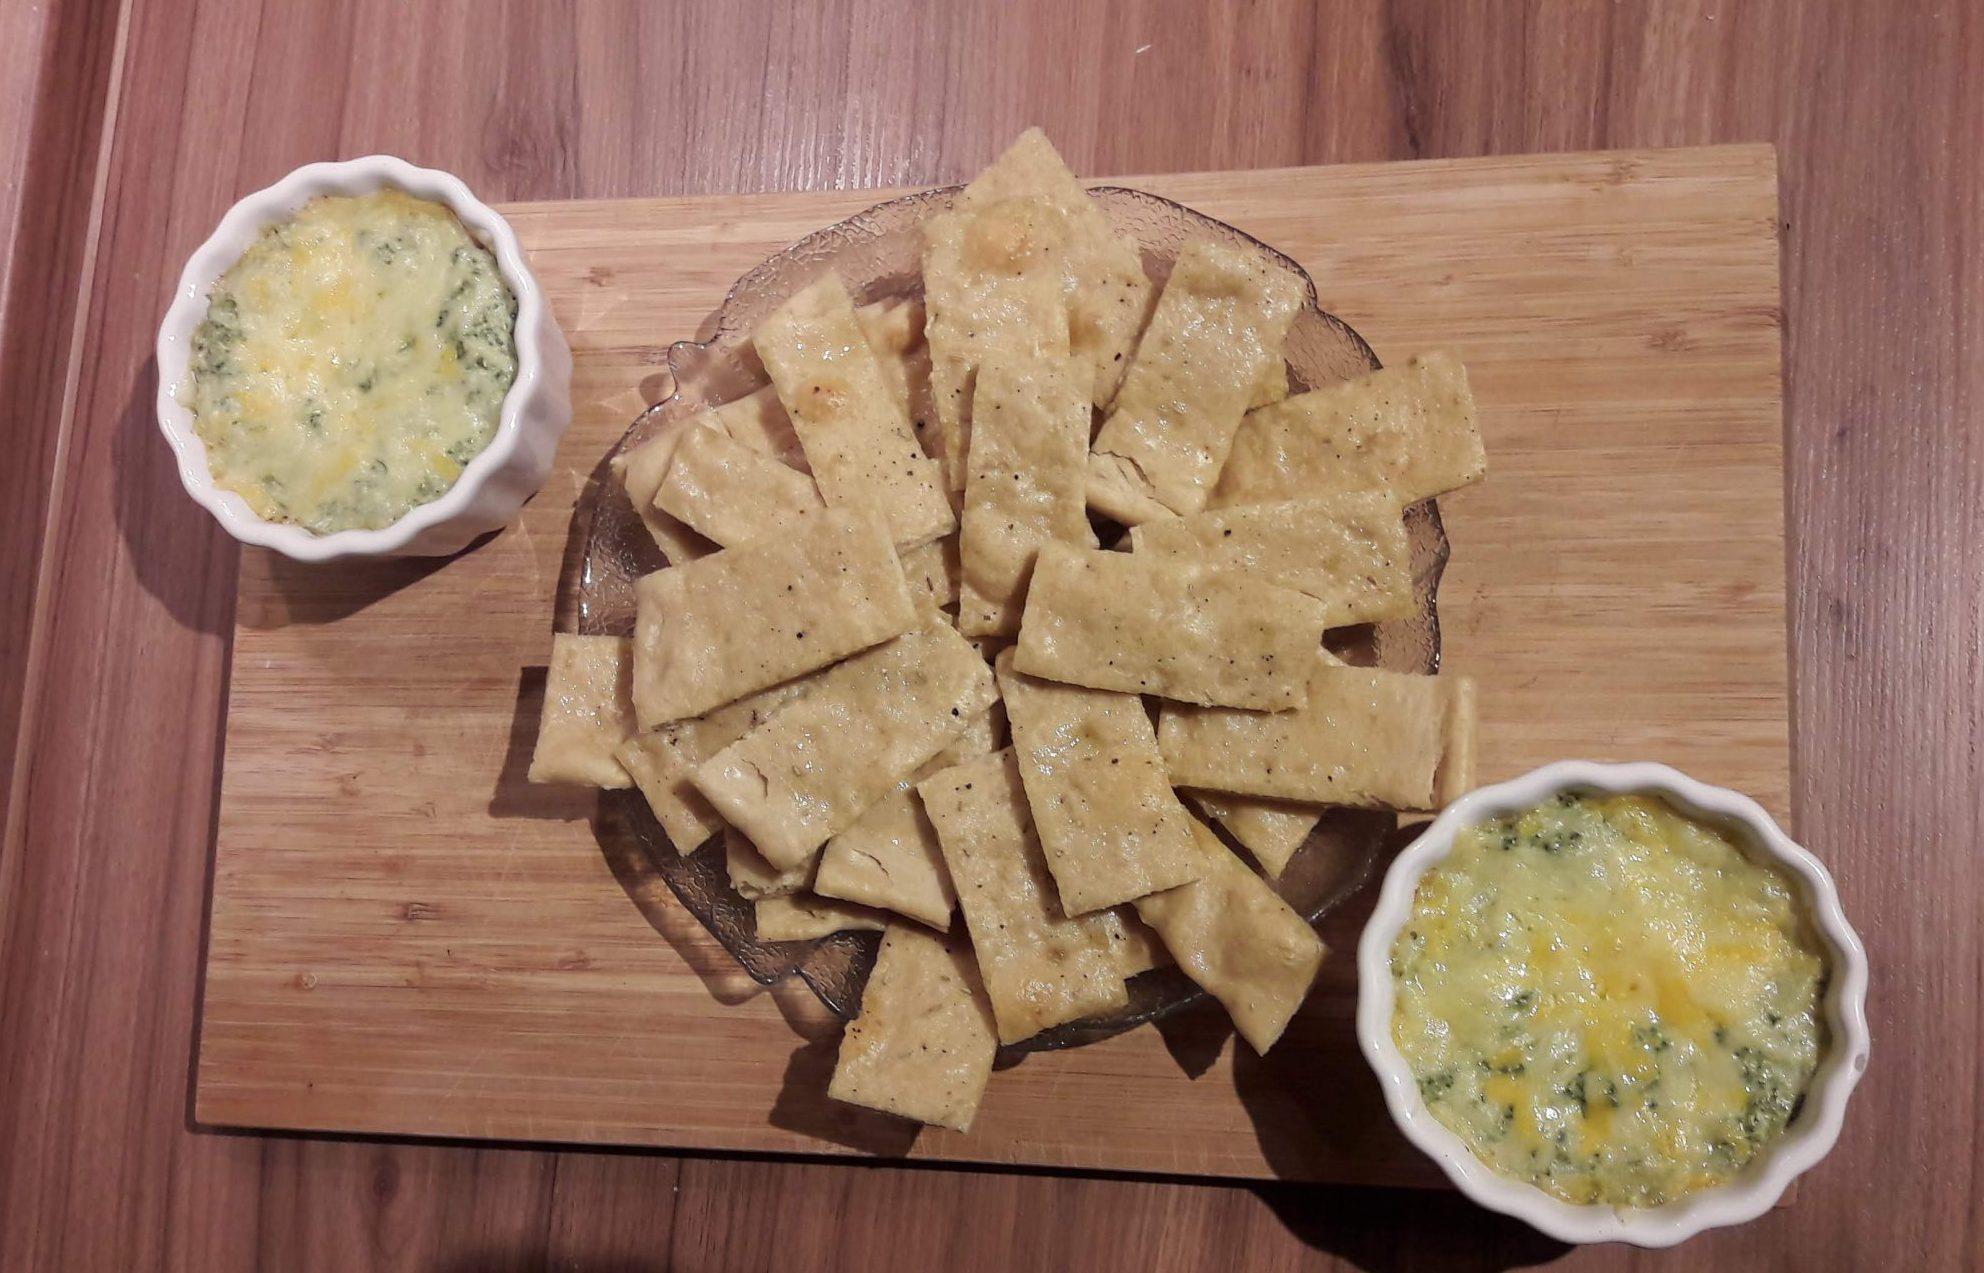 Spinat Käse Dip mit Knoblauchbrot